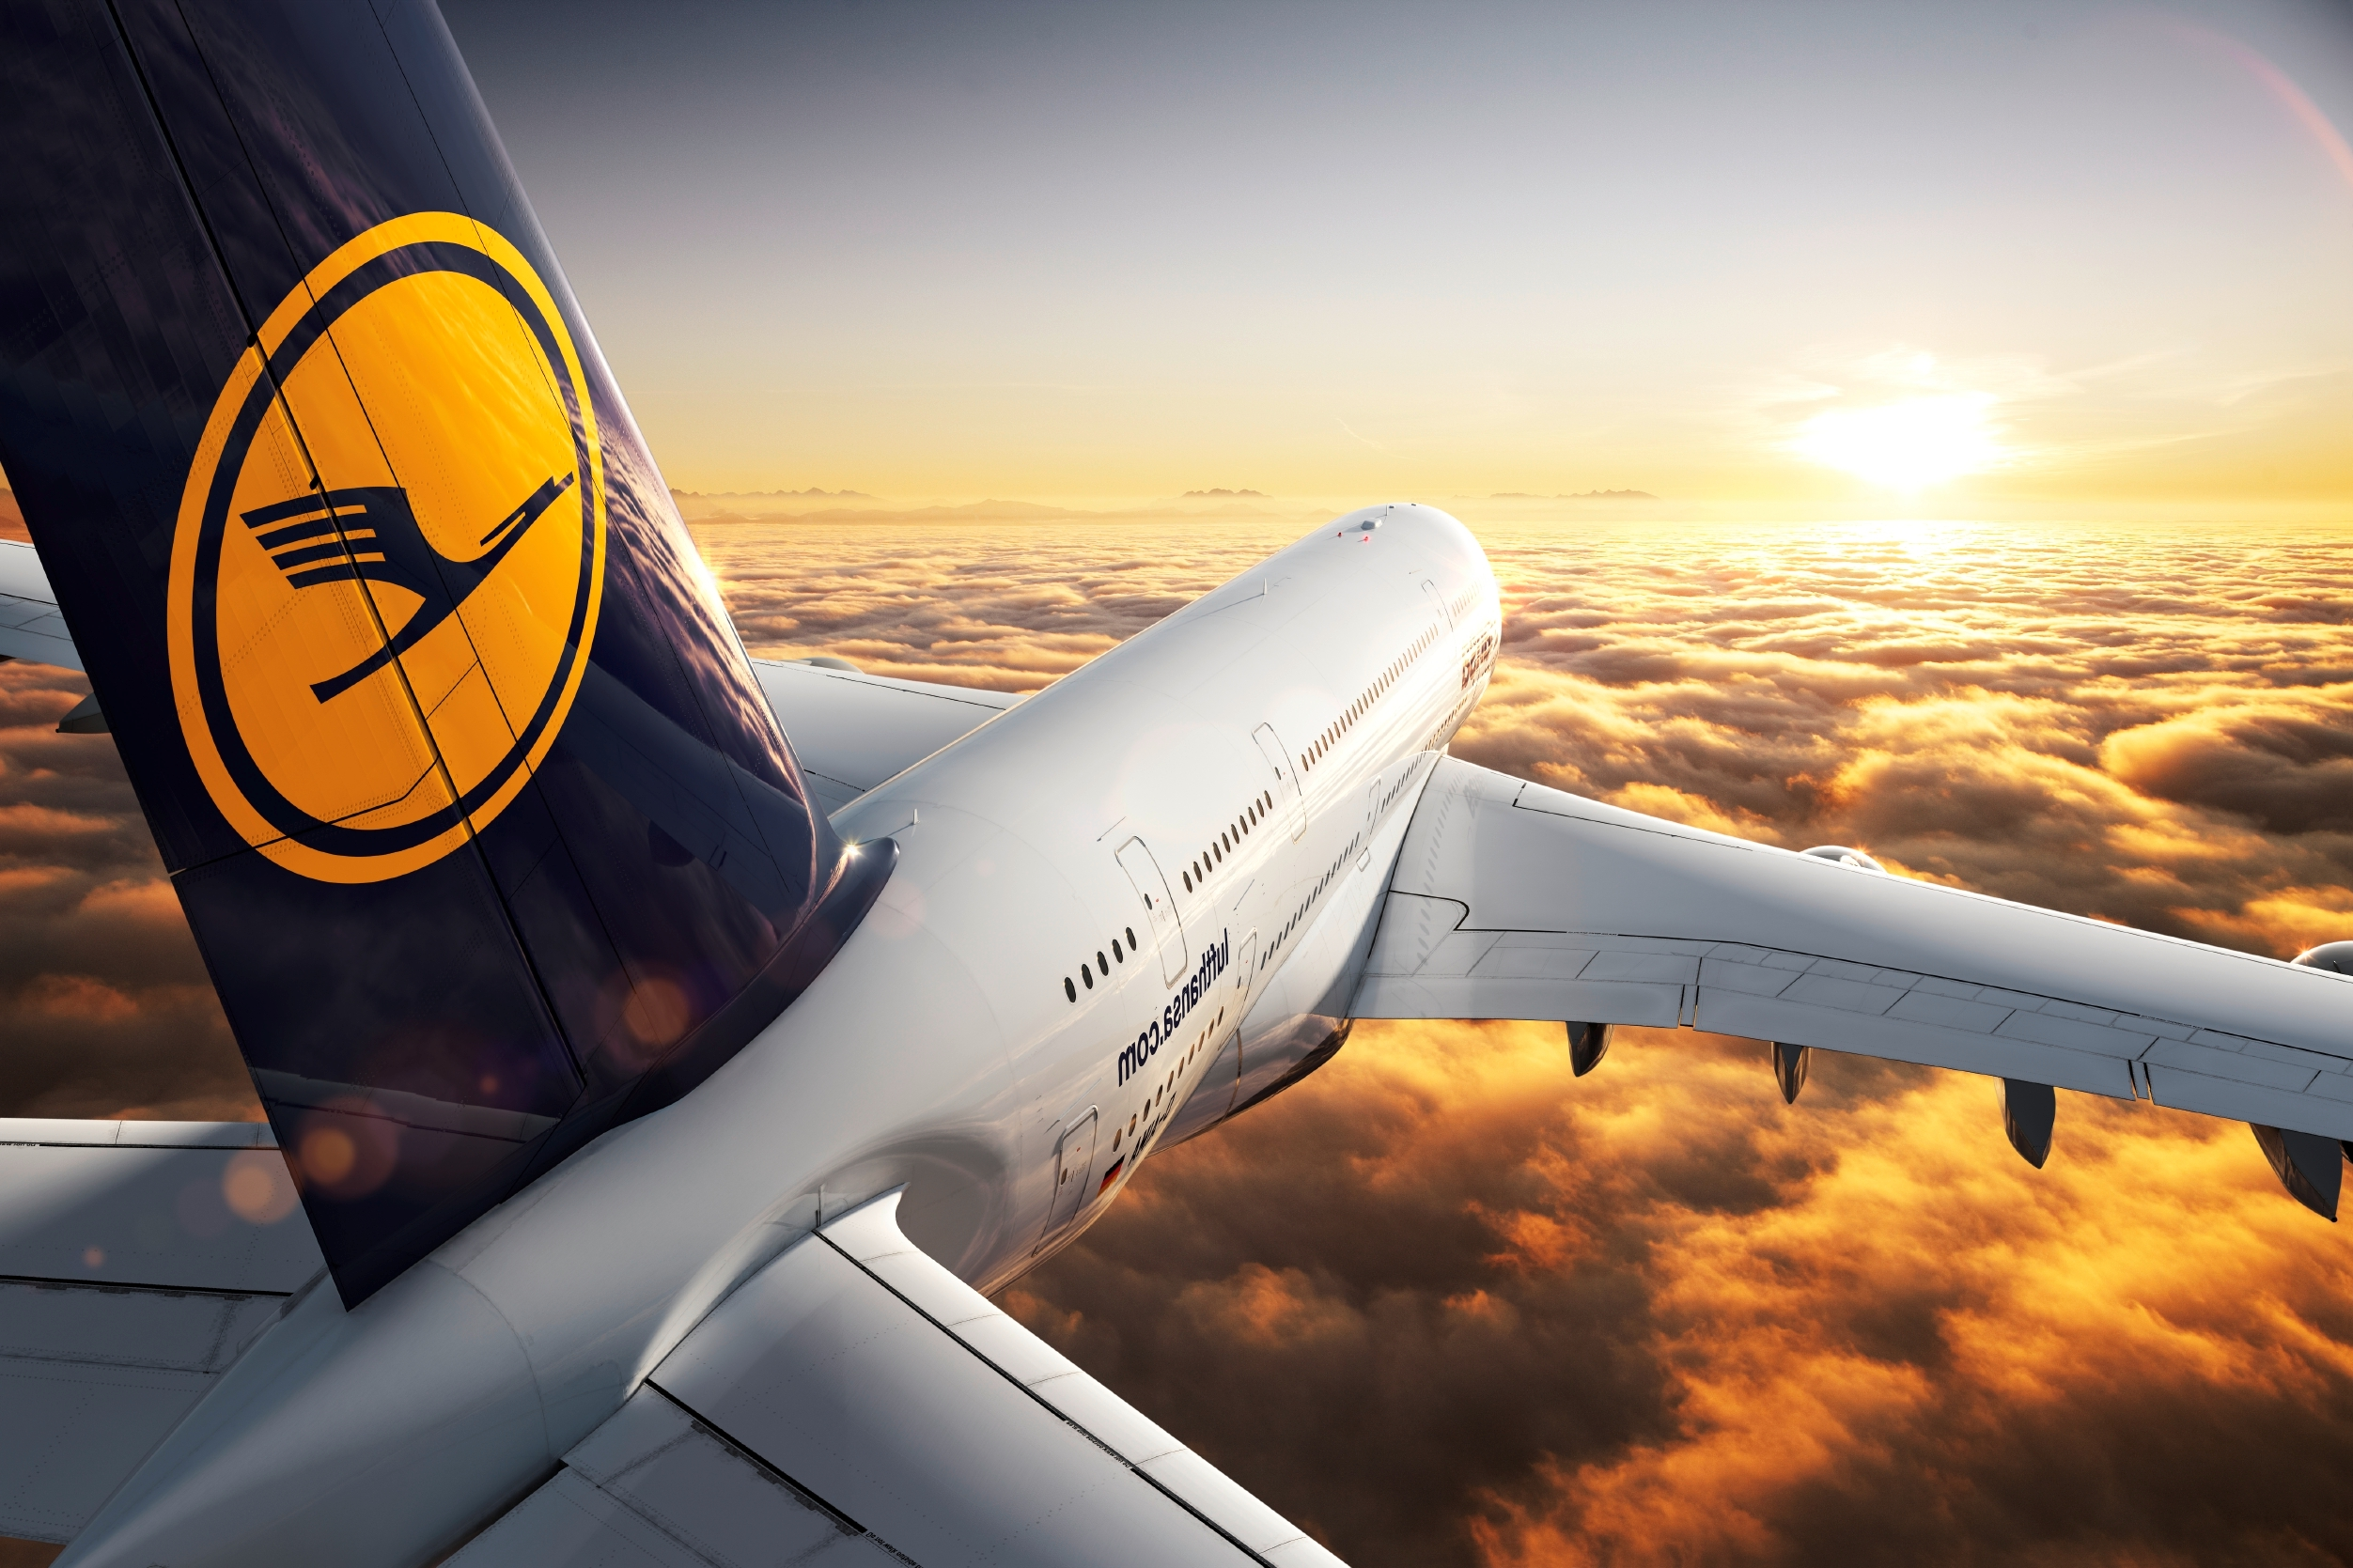 Lufthansa va zbura cu Airbus A380 la Bangkok, iar Etihad va introduce același tip de avion către Paris